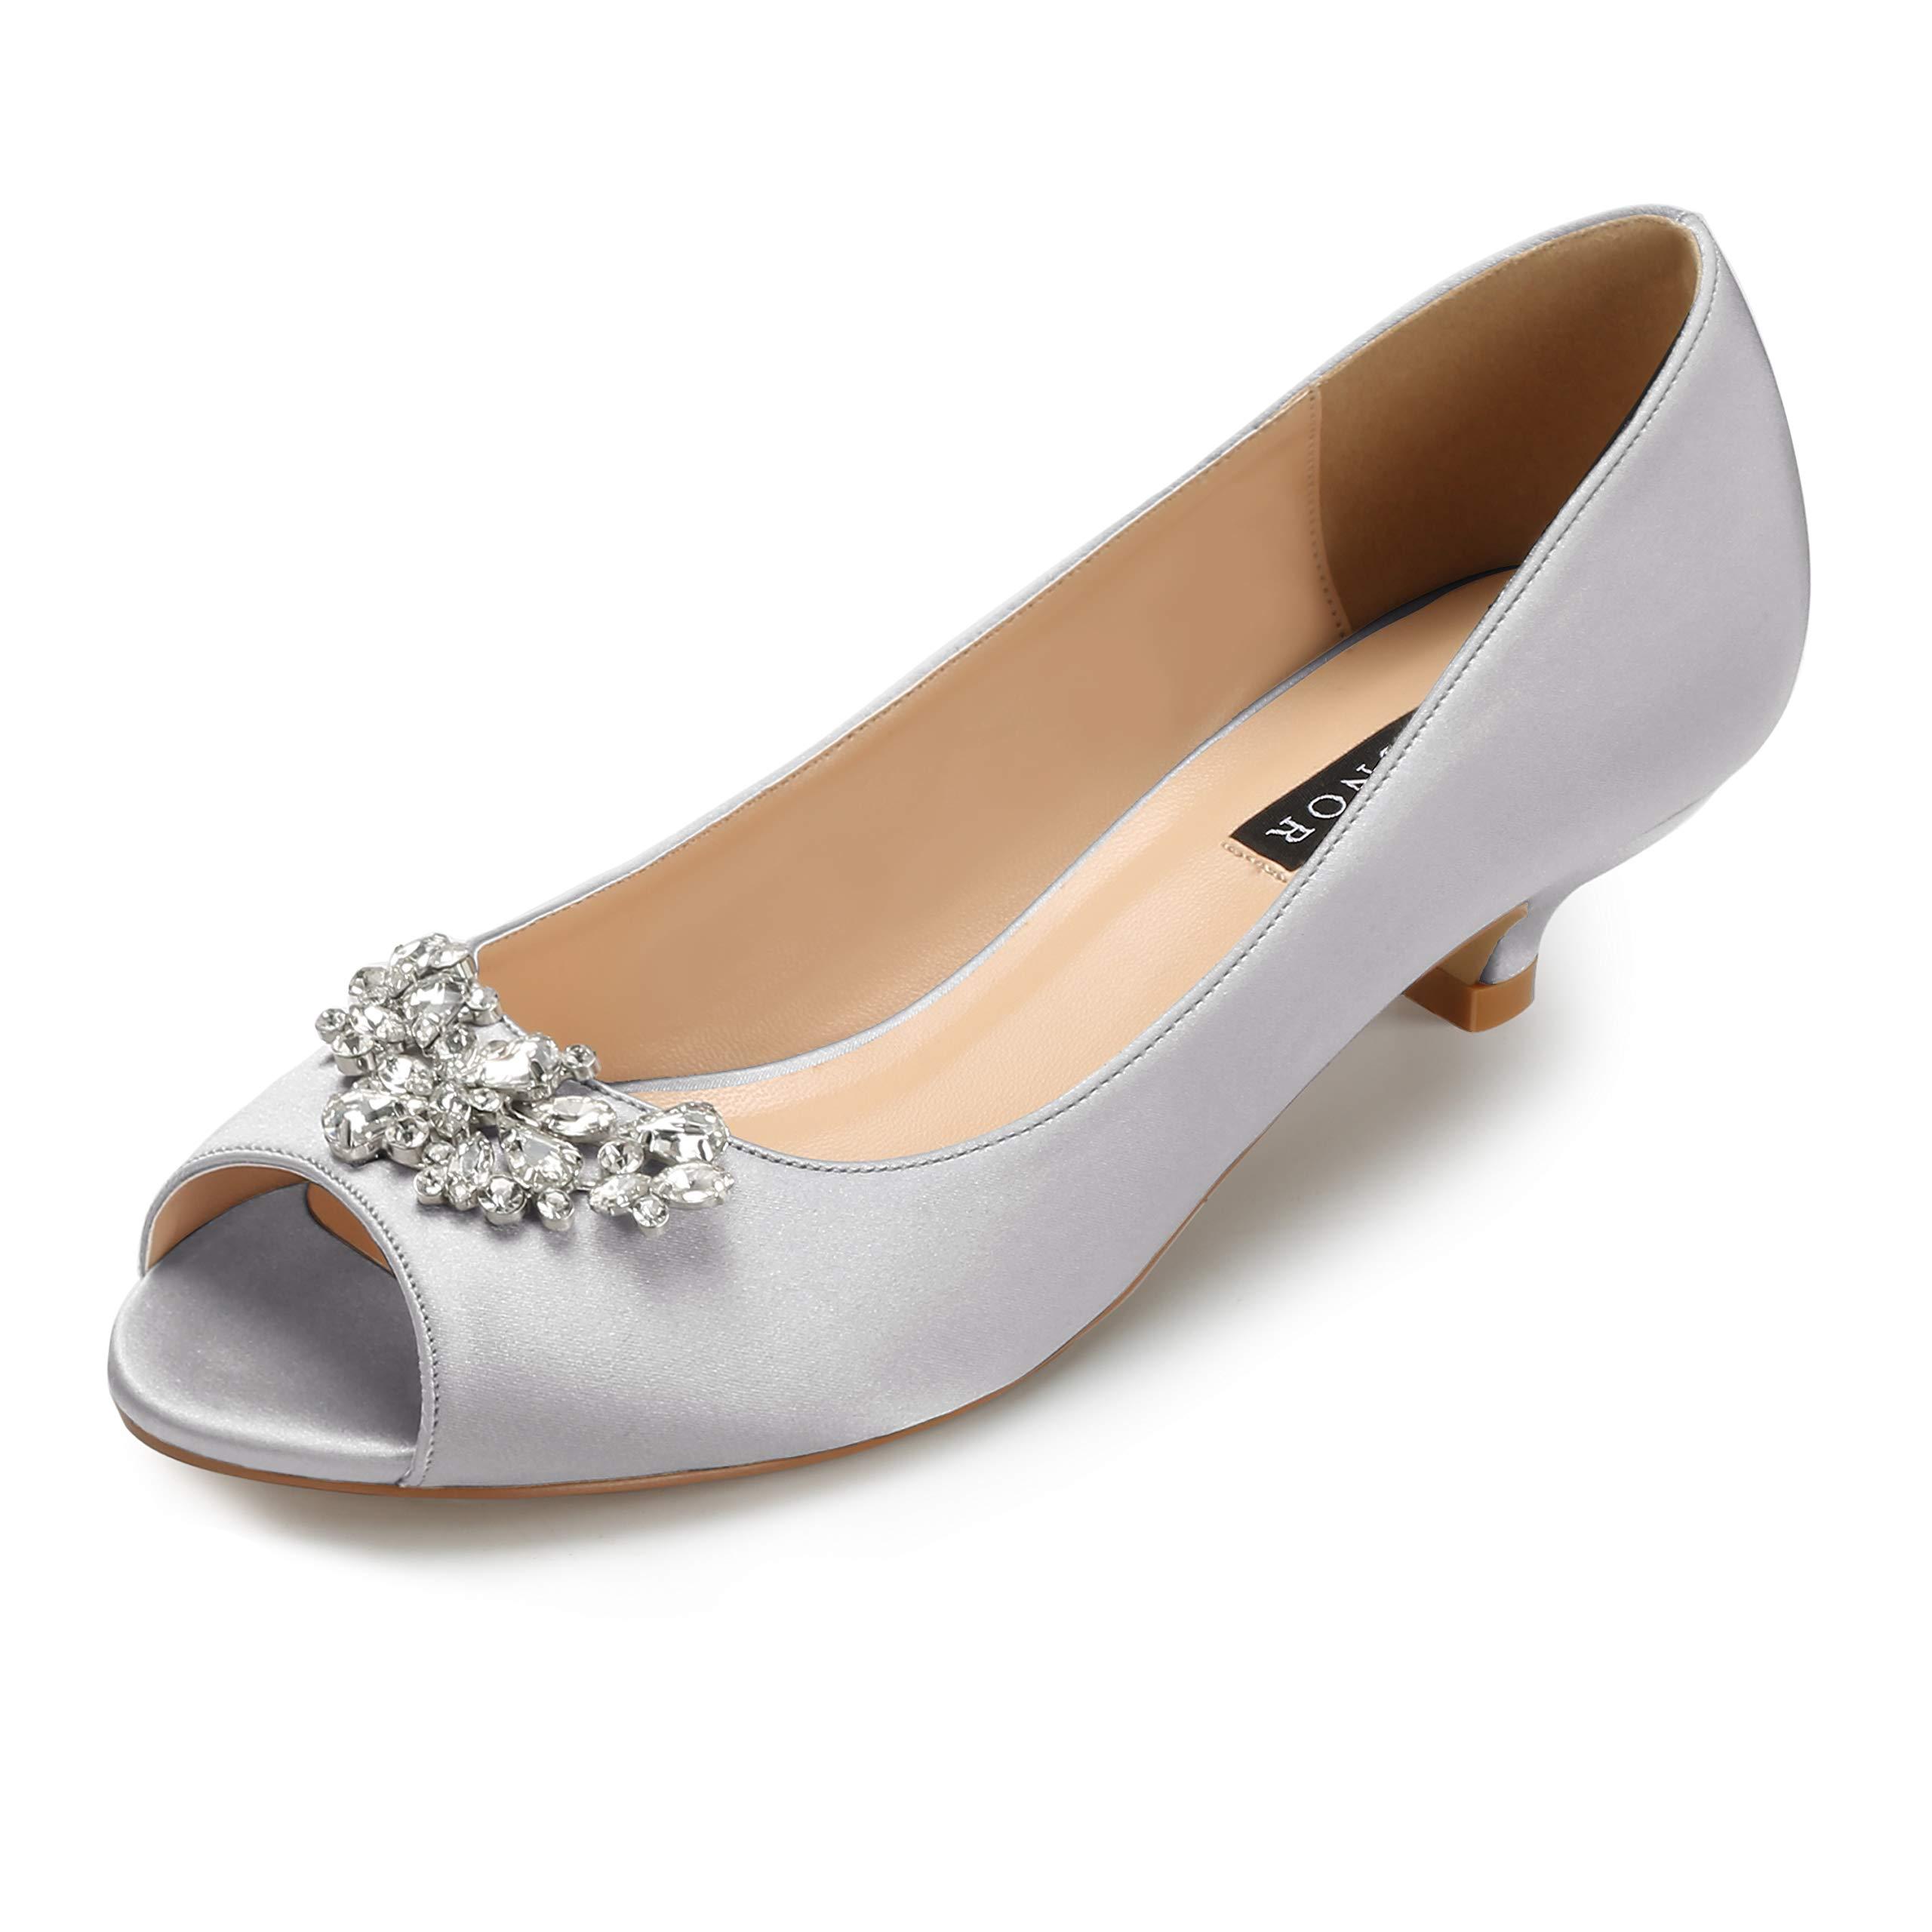 Erijunor E0111 Women Comfort Low Kitten Heels Rhinestones Peep Toe Wedding Evening Party Shoes Dress Pumps Silver Size 9